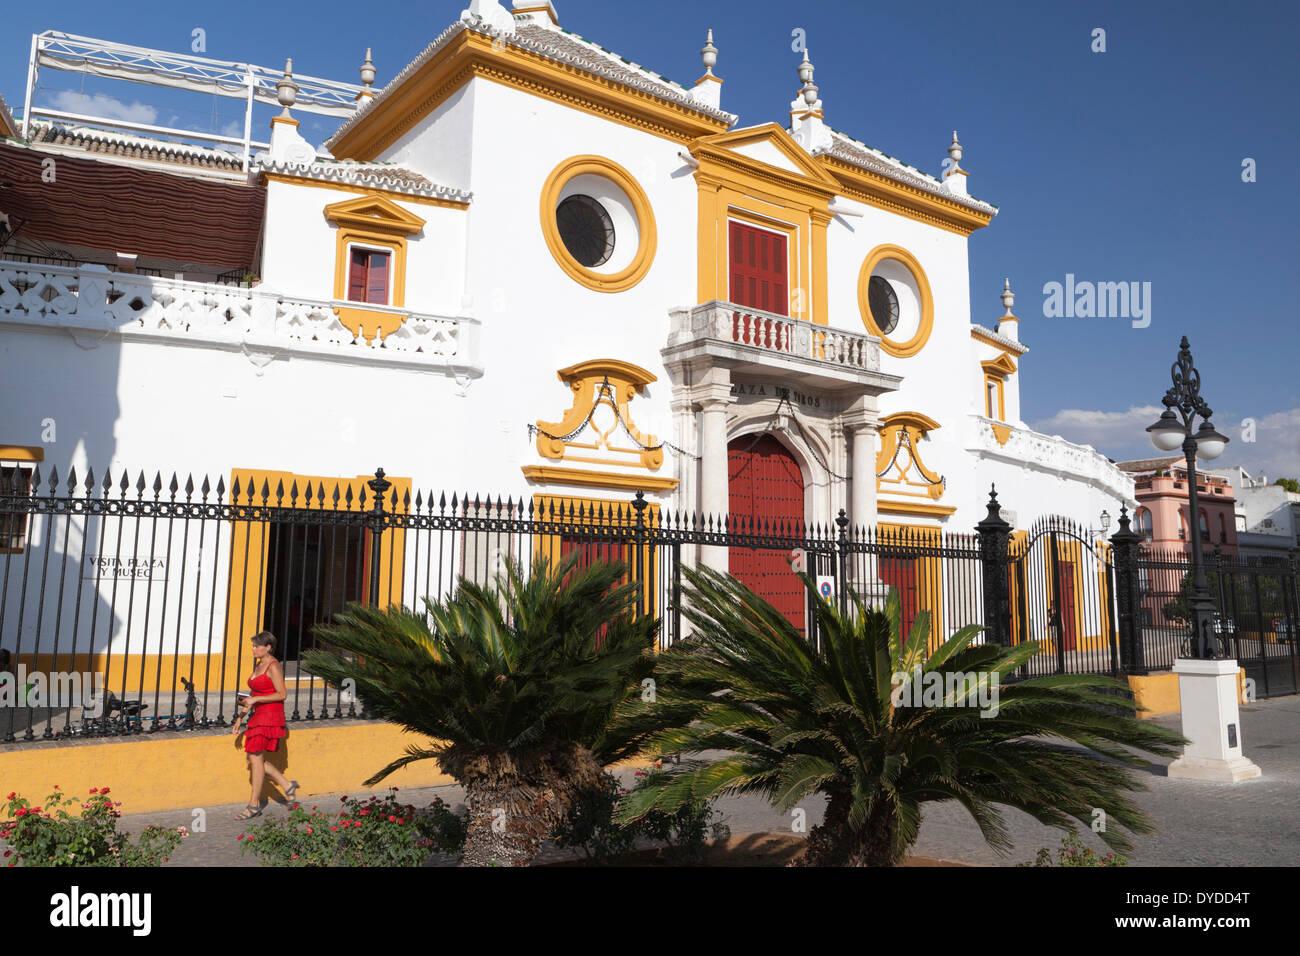 A woman dressed in red walks by the Plaza de toros de la Real Maestranza. - Stock Image